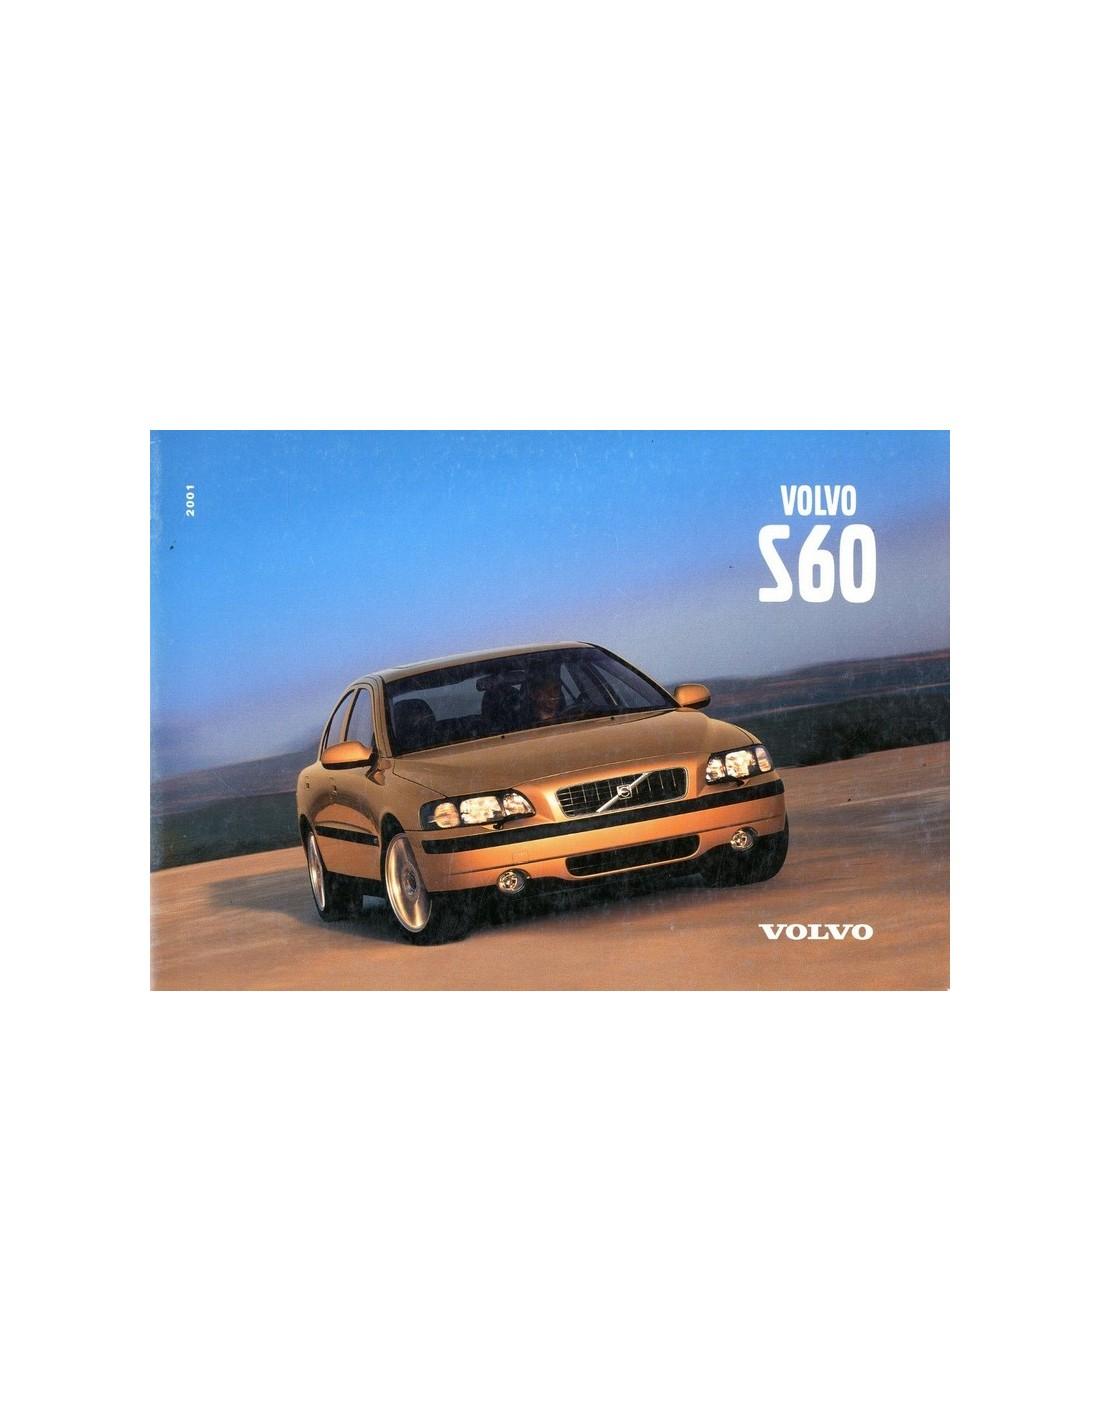 service manual  free 2001 volvo s60 repair maunuel free 2003 Chevrolet Tahoe 2003 Chevrolet Trailblazer Custom